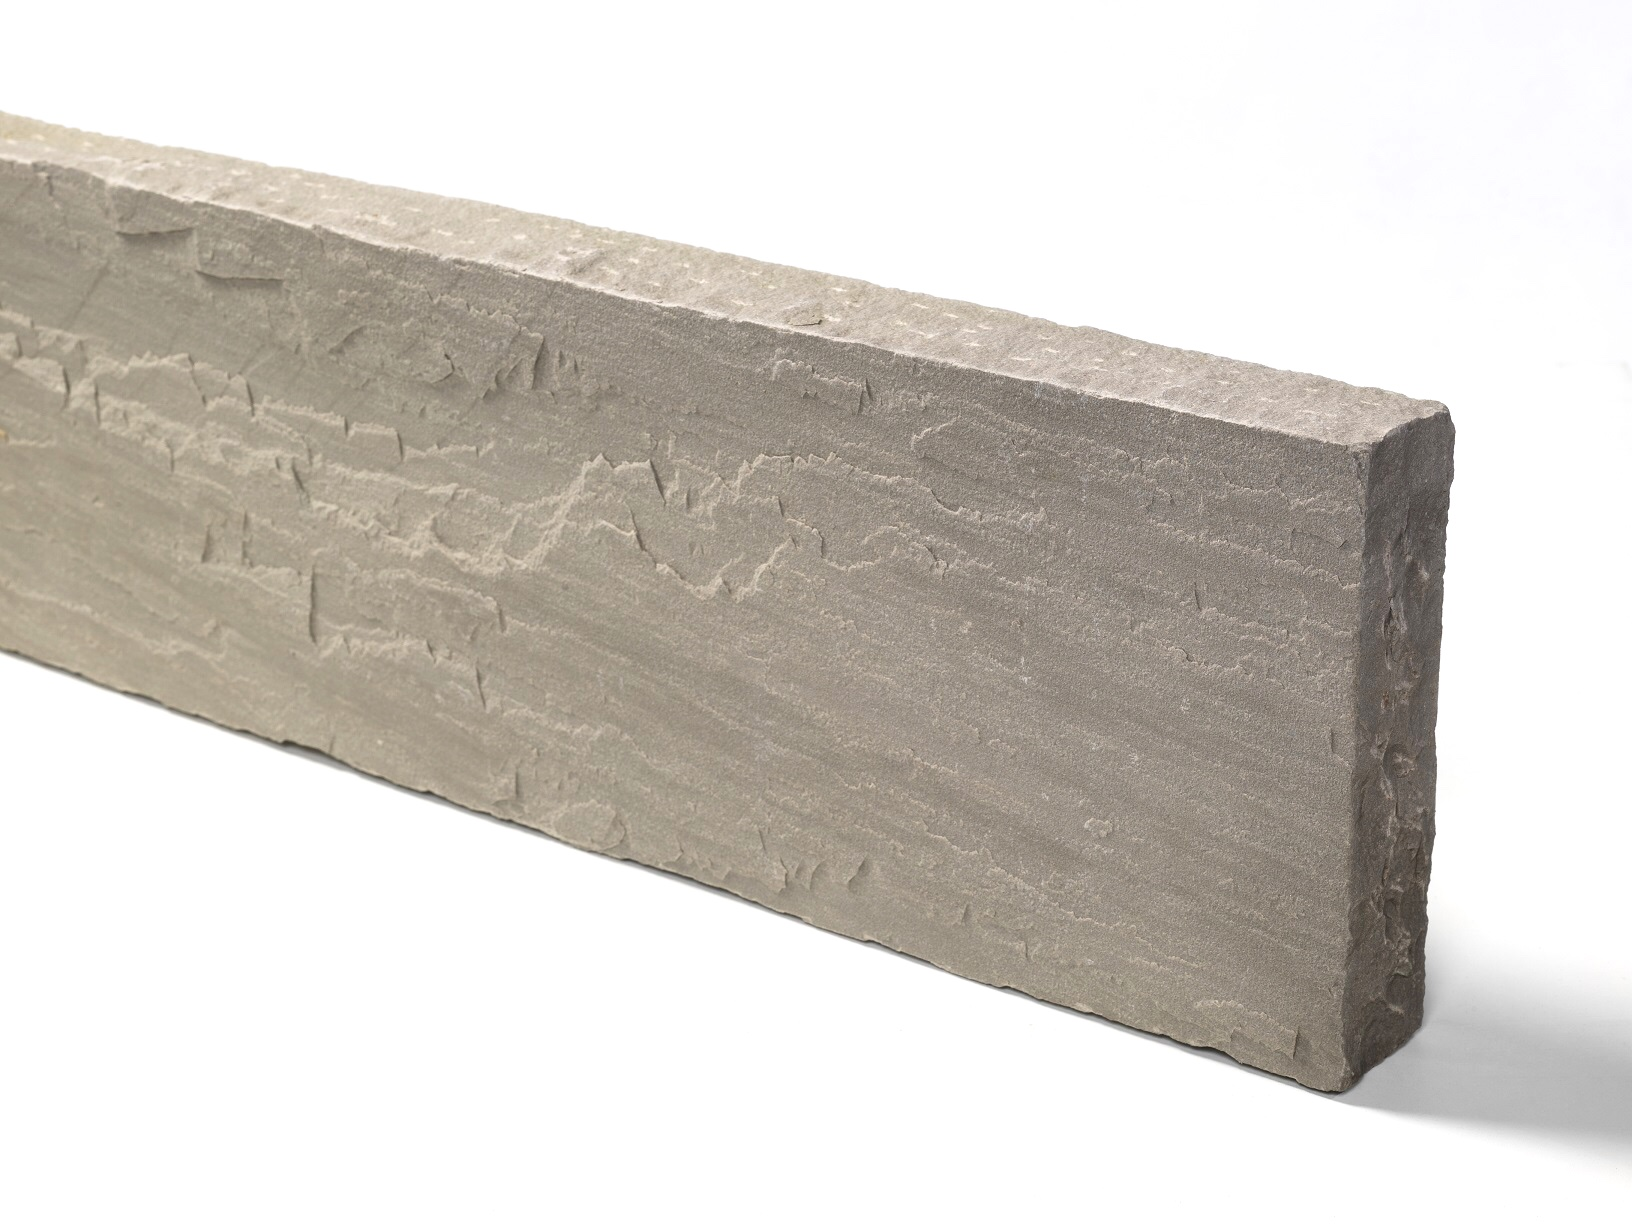 quarz sand kantenstein 6x20x100 cm grau. Black Bedroom Furniture Sets. Home Design Ideas